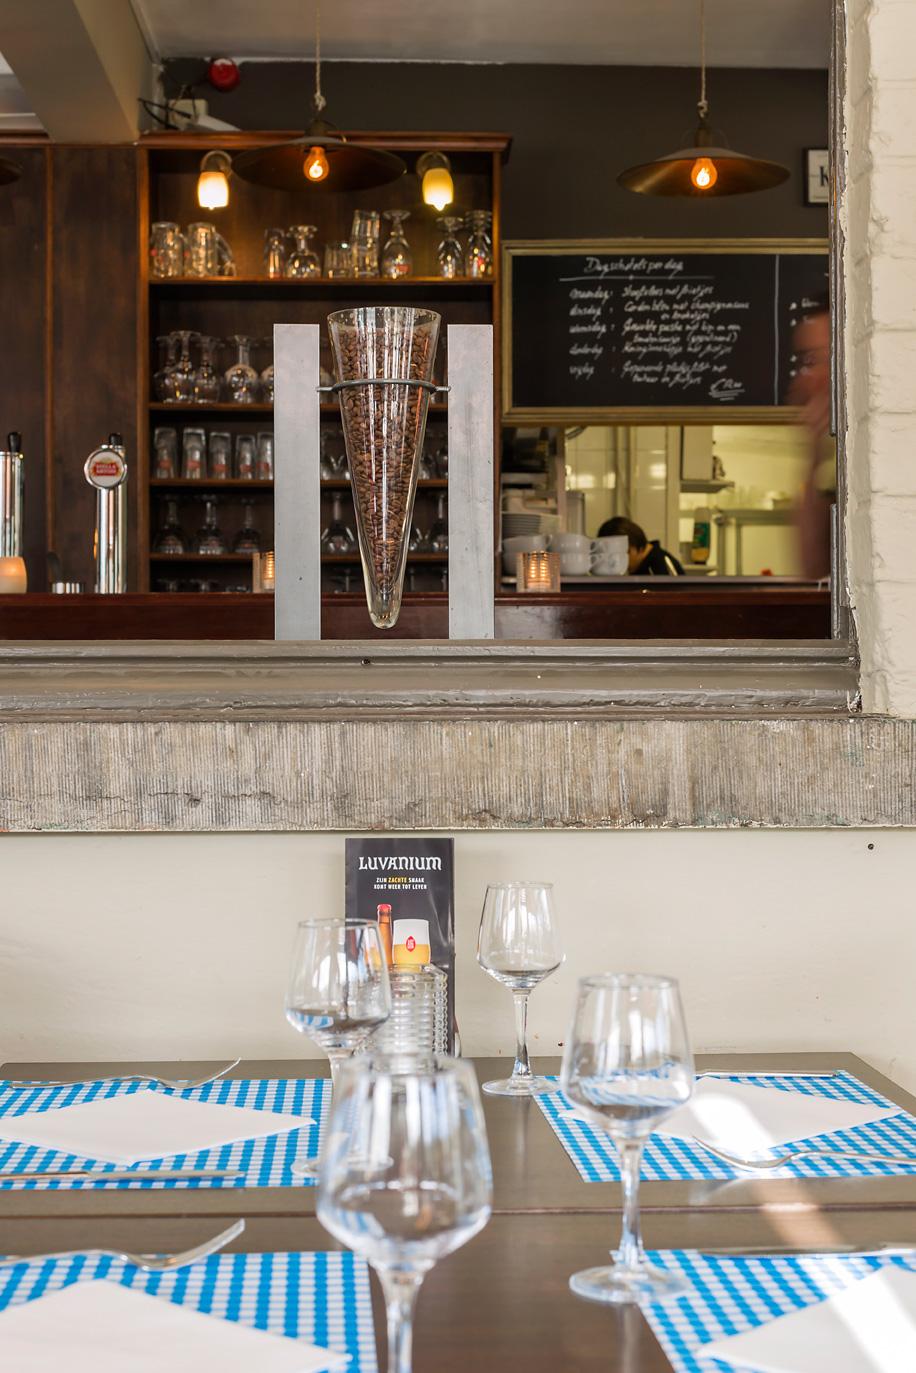 Brasserie-Bleu-Blanc-in-Oud-Heverlee_Bleu_Blanc_DSC2476_150227